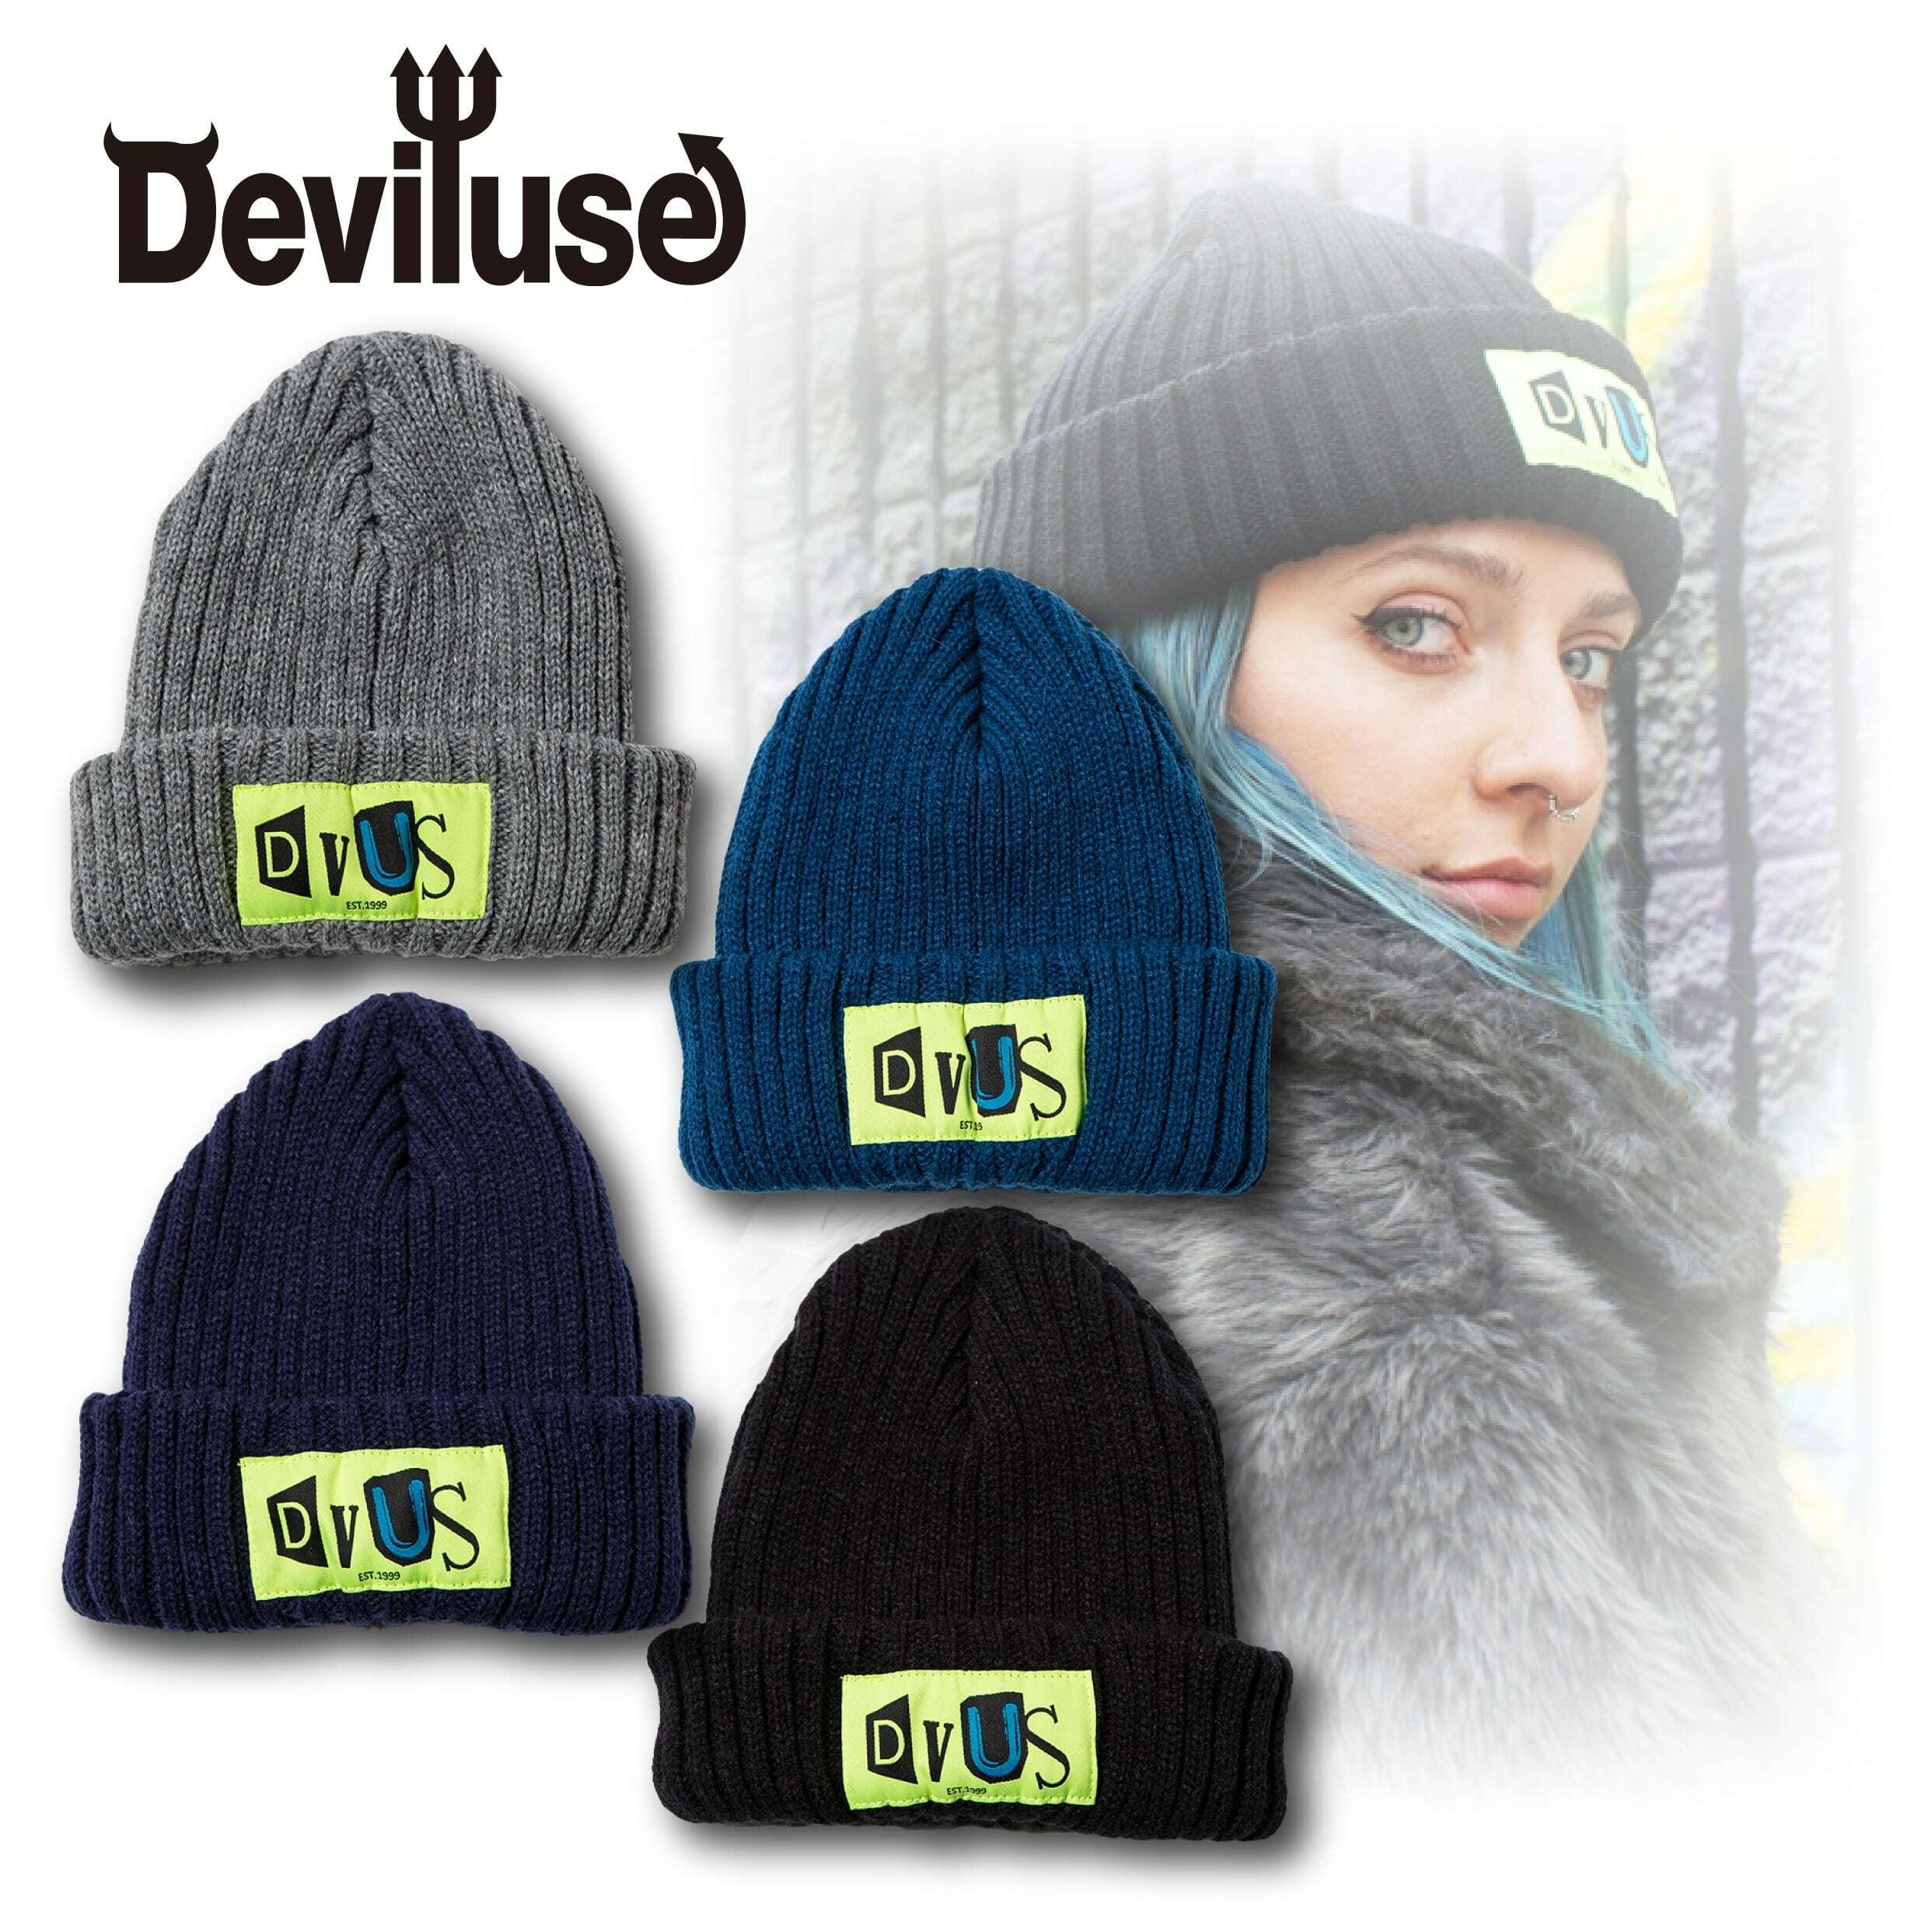 Deviluse(デビルユース) | Claim Beanie